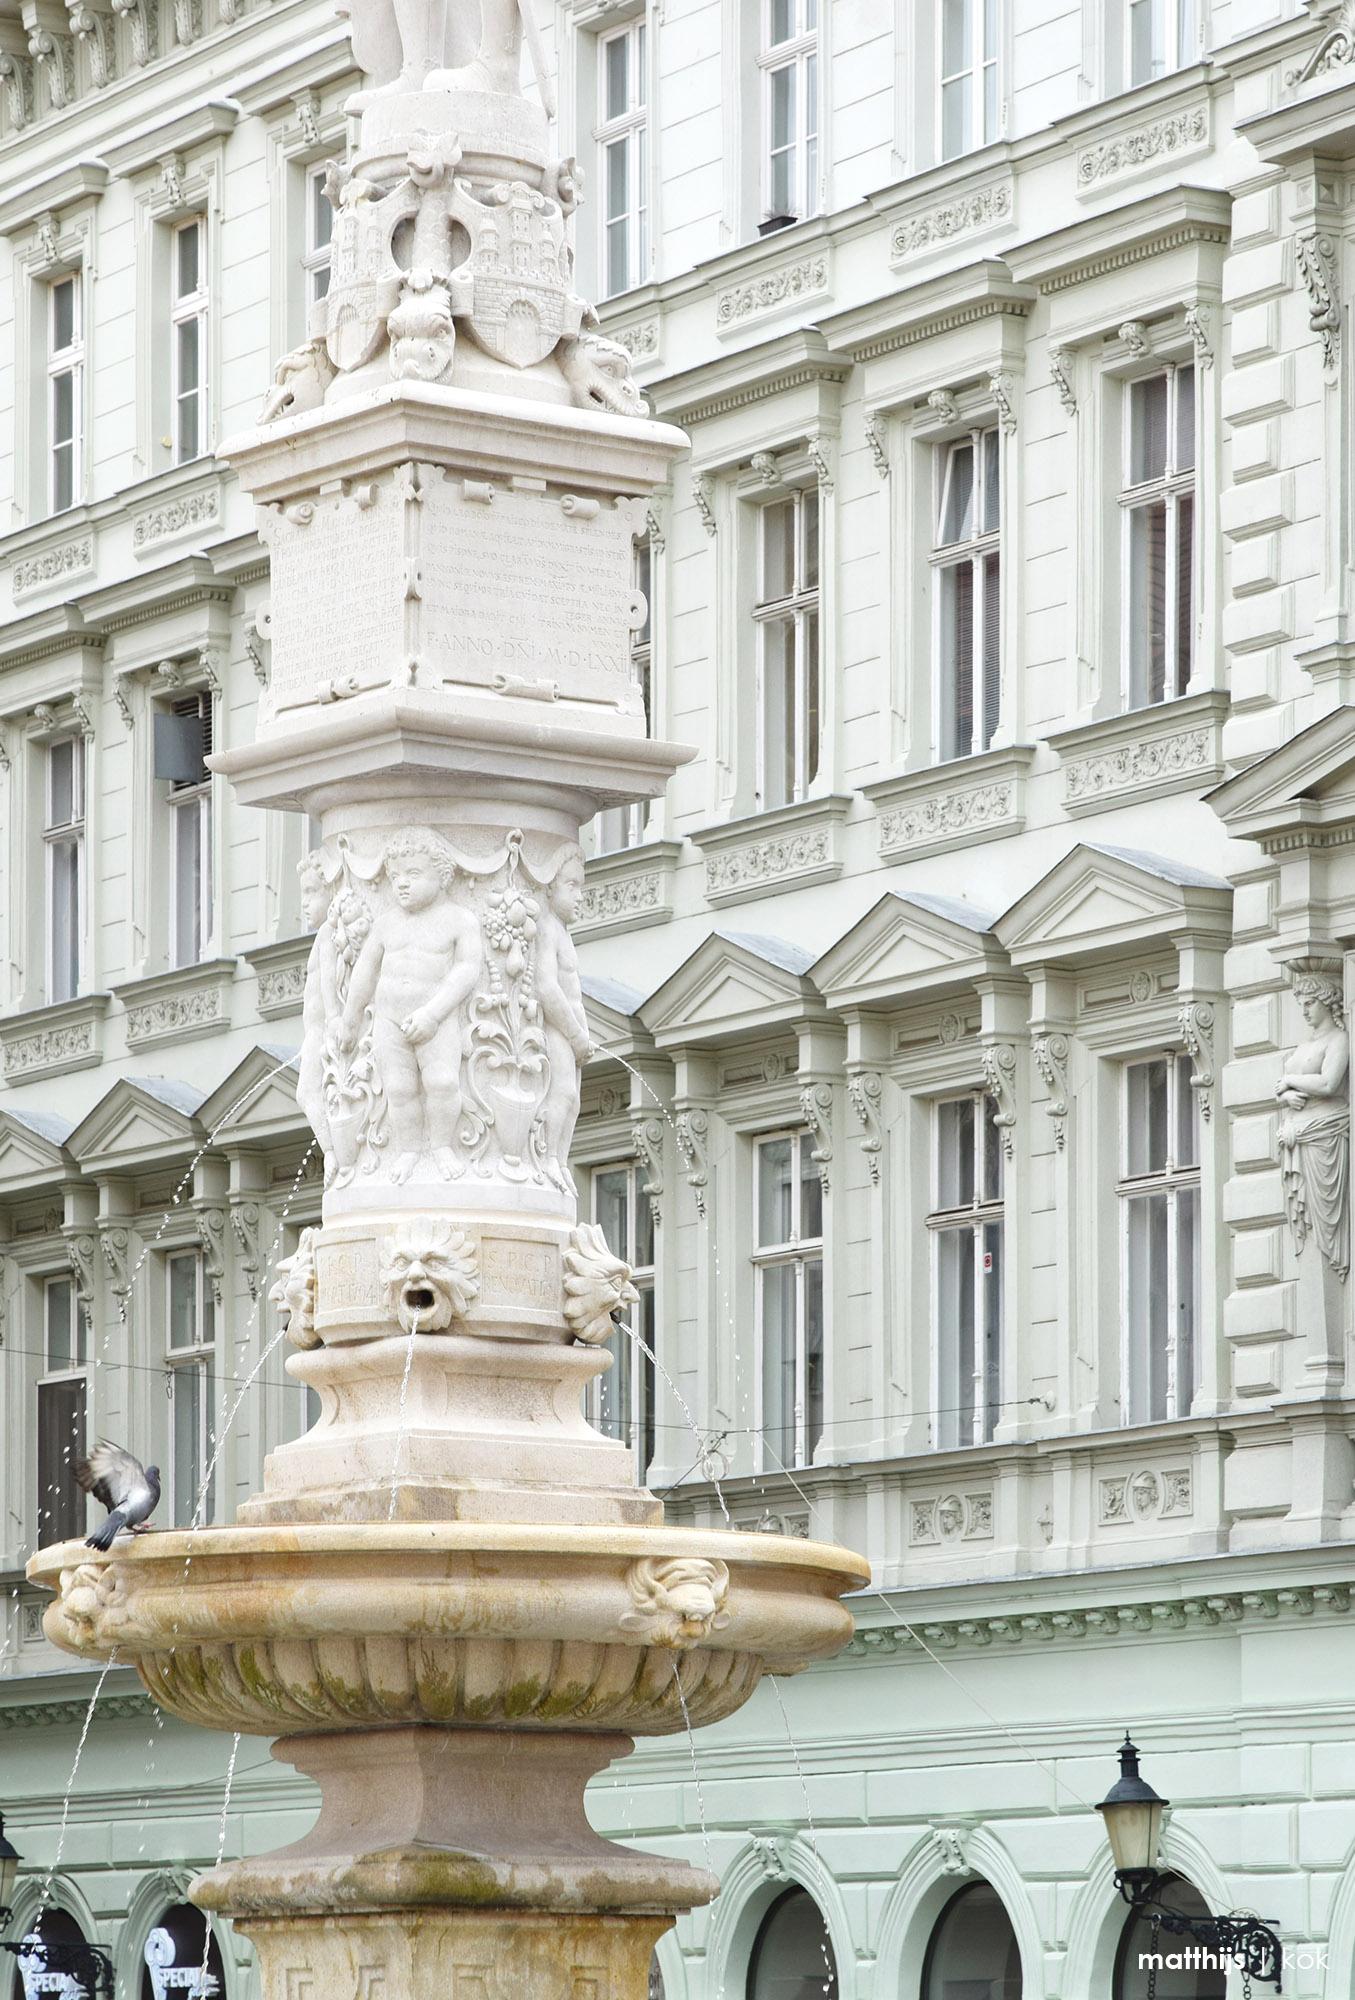 Roland's Fountain, Bratislava, Slovakia | Photo by Matthijs Kok